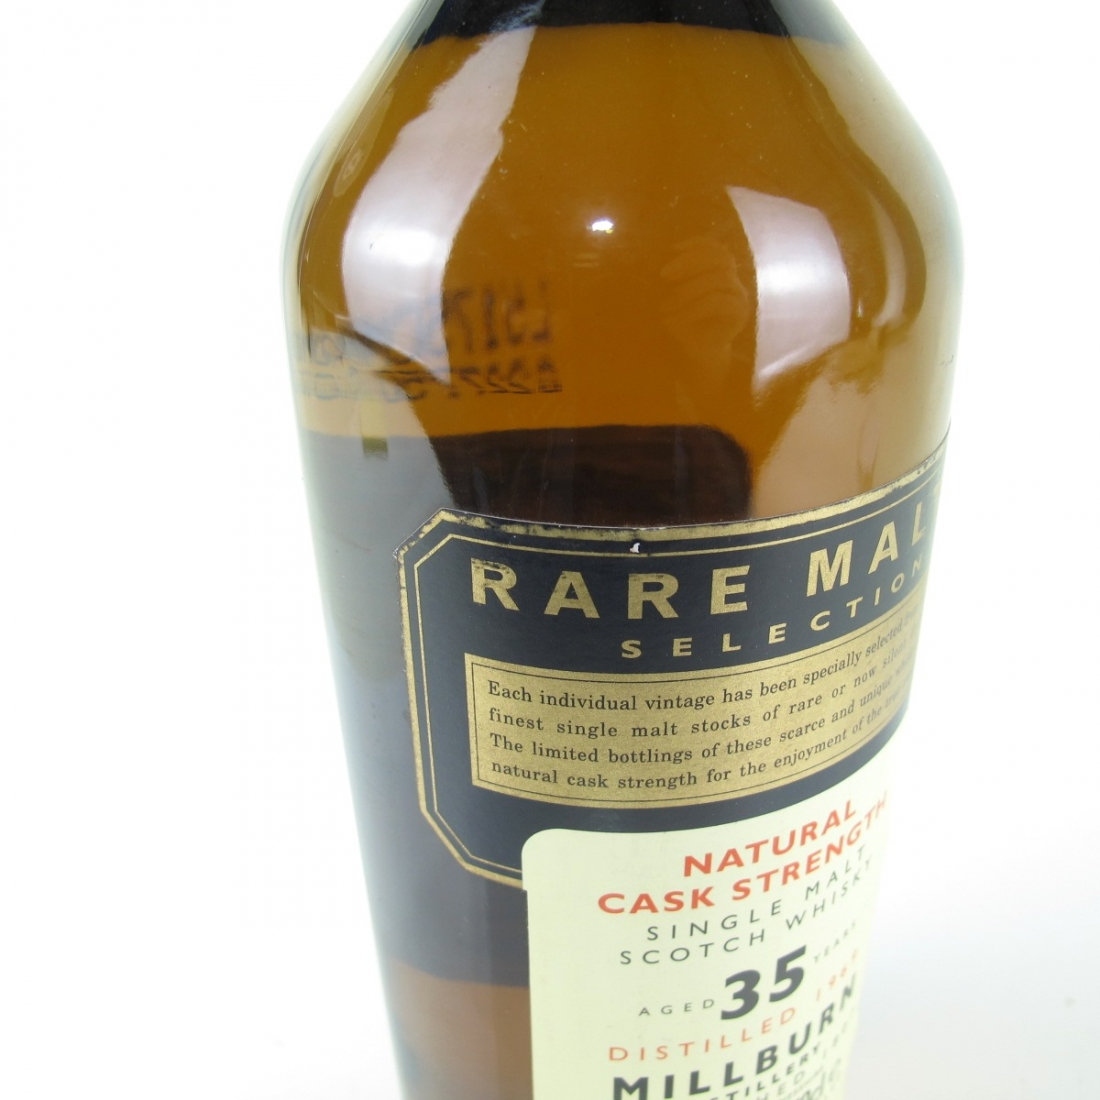 Millburn 1969 Rare Malt 35 Year Old / 51.2%